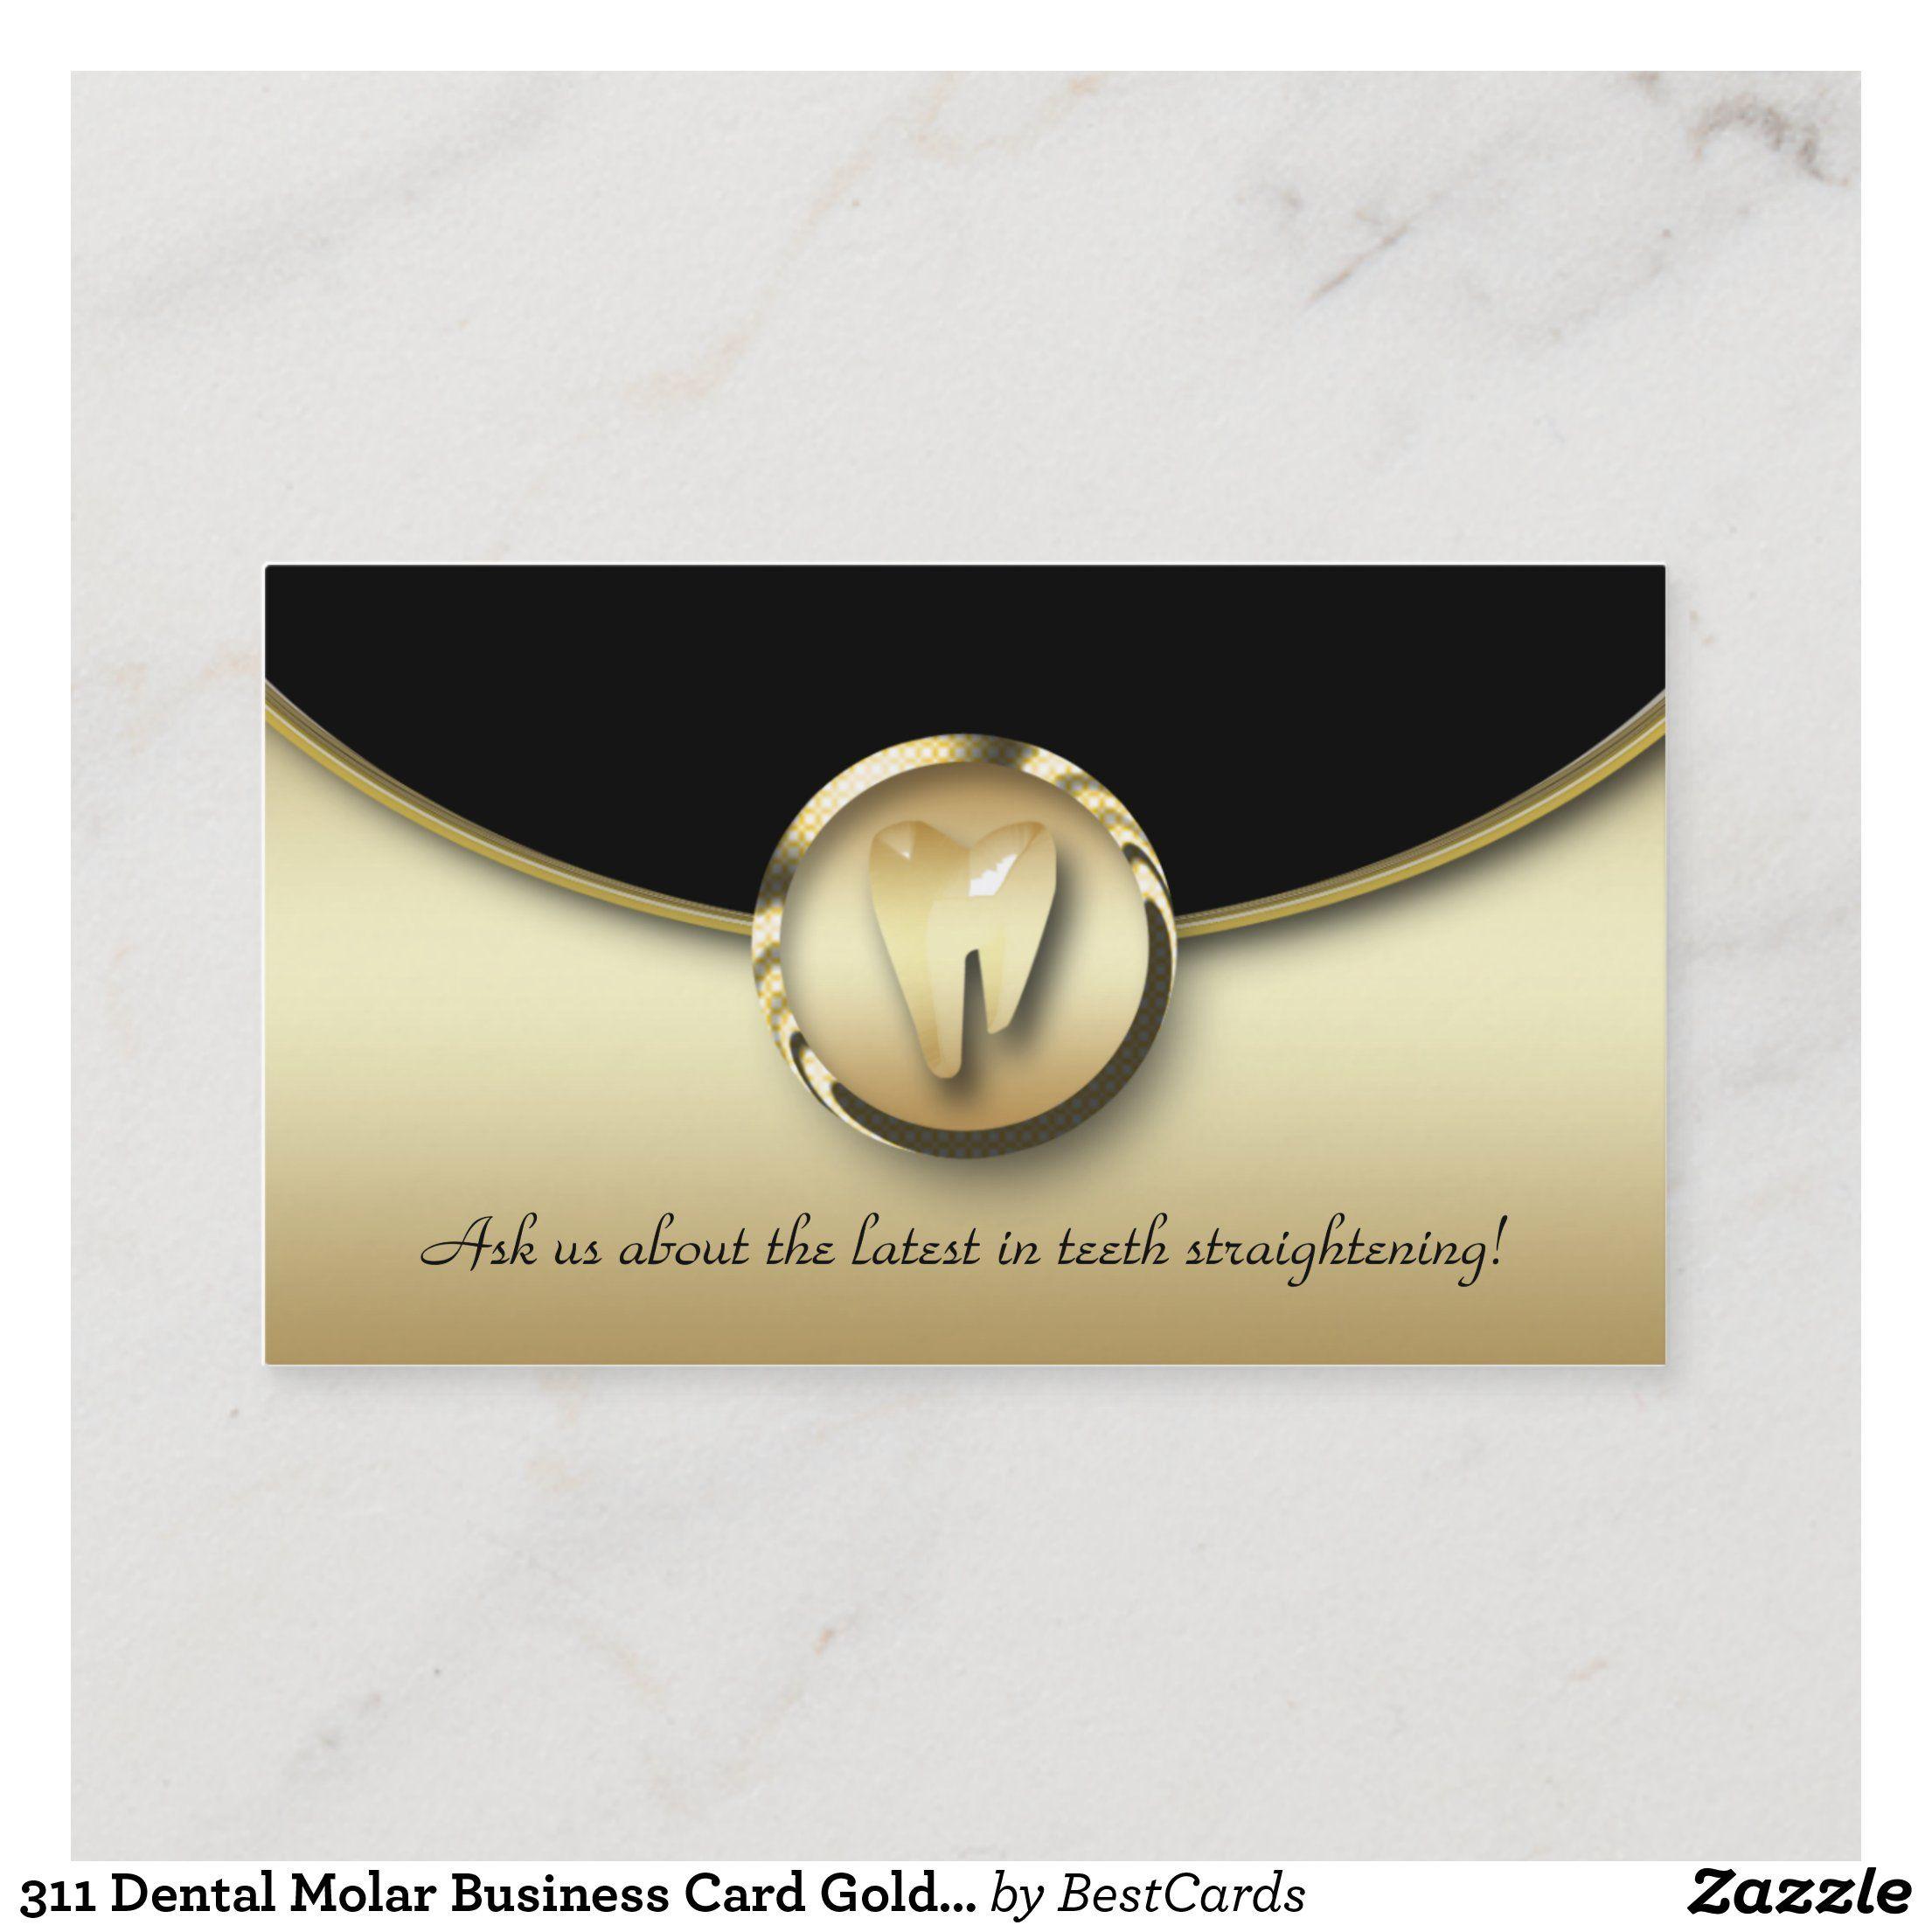 311 dental molar business card gold metal black zazzle